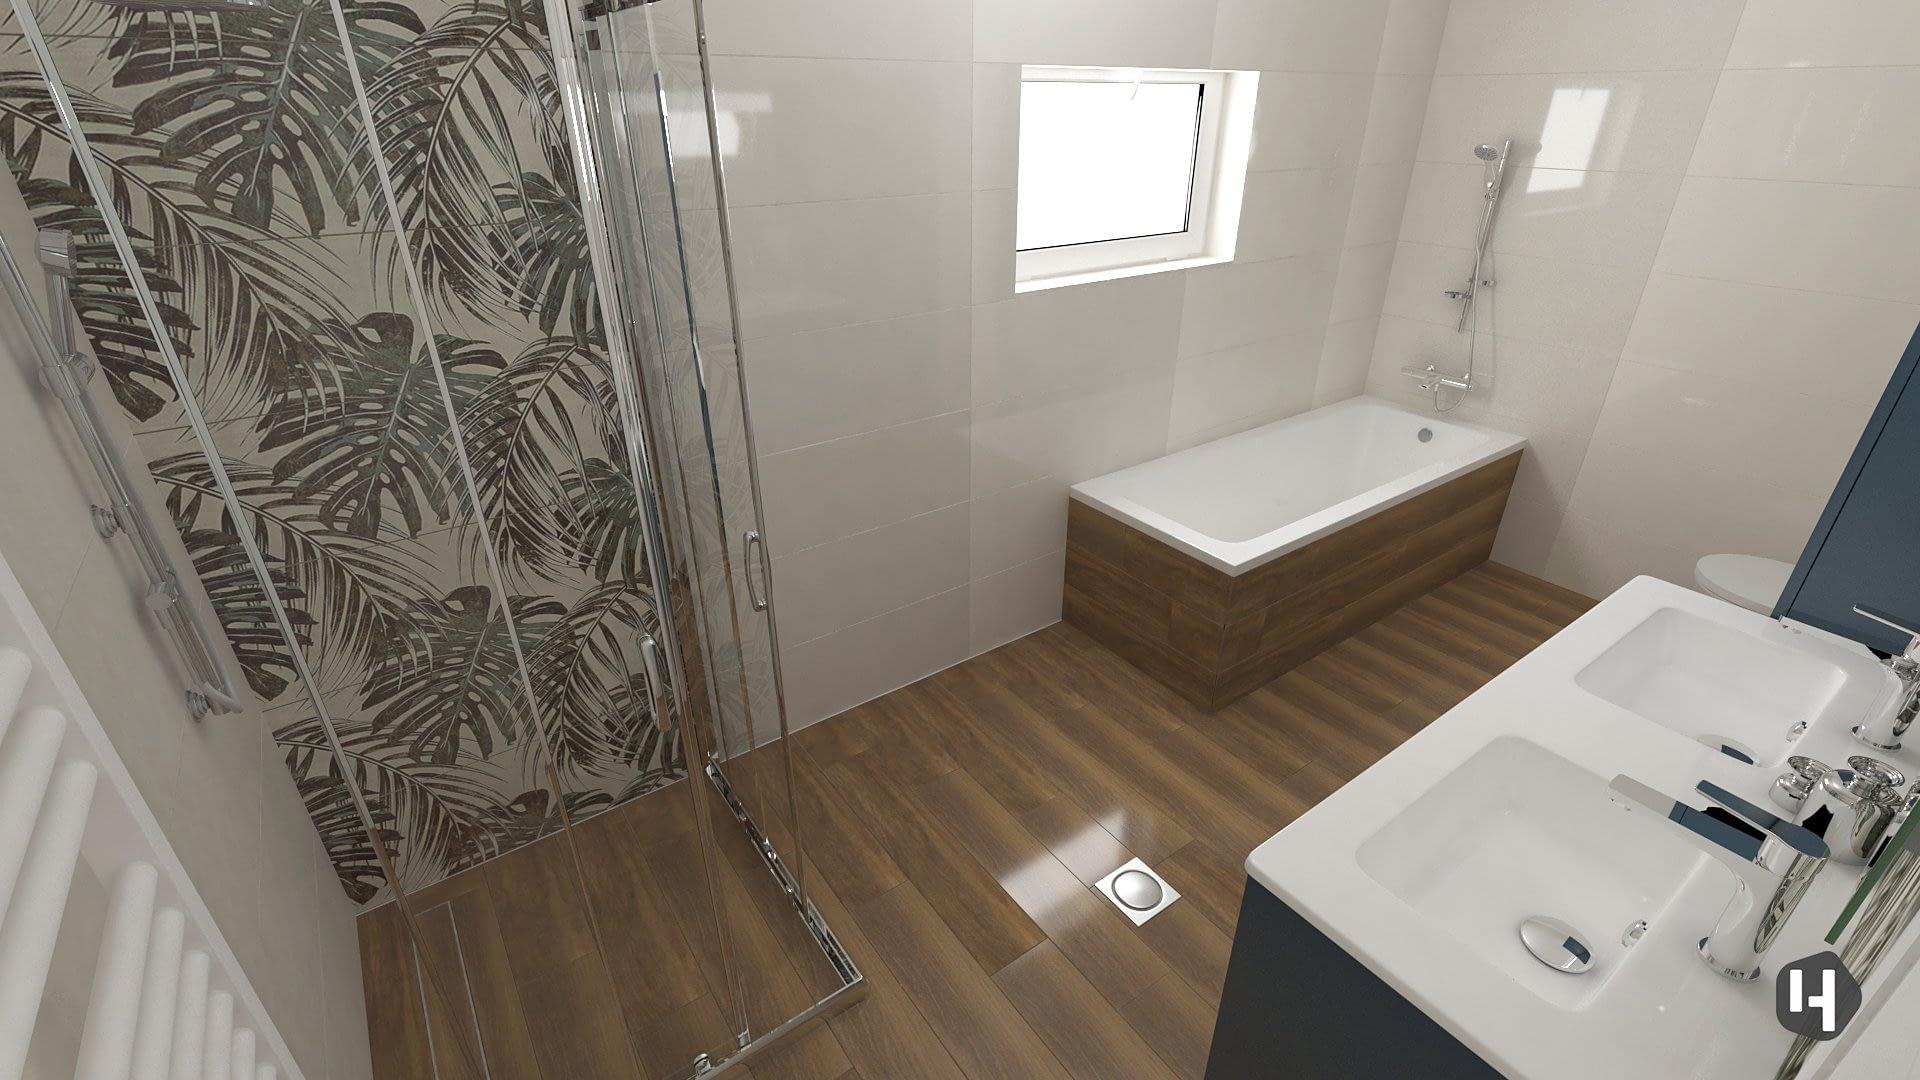 Monstera Leaves Bathroom design 01